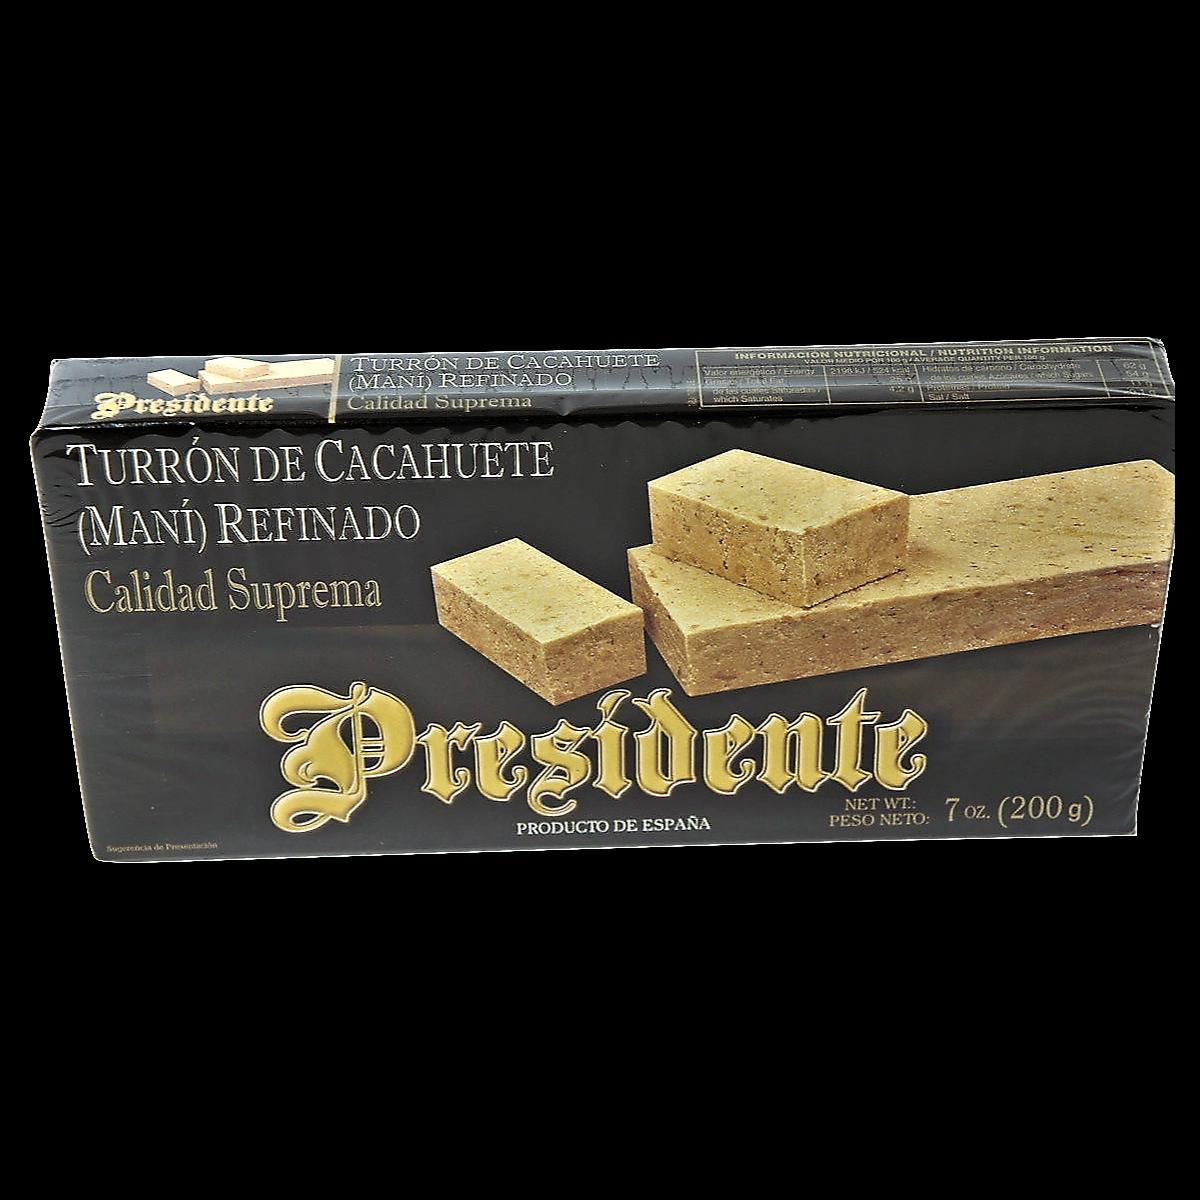 Шоколад Turron de cacahuete - President. 200гр. Испанский арахисовый туррон - Президент.